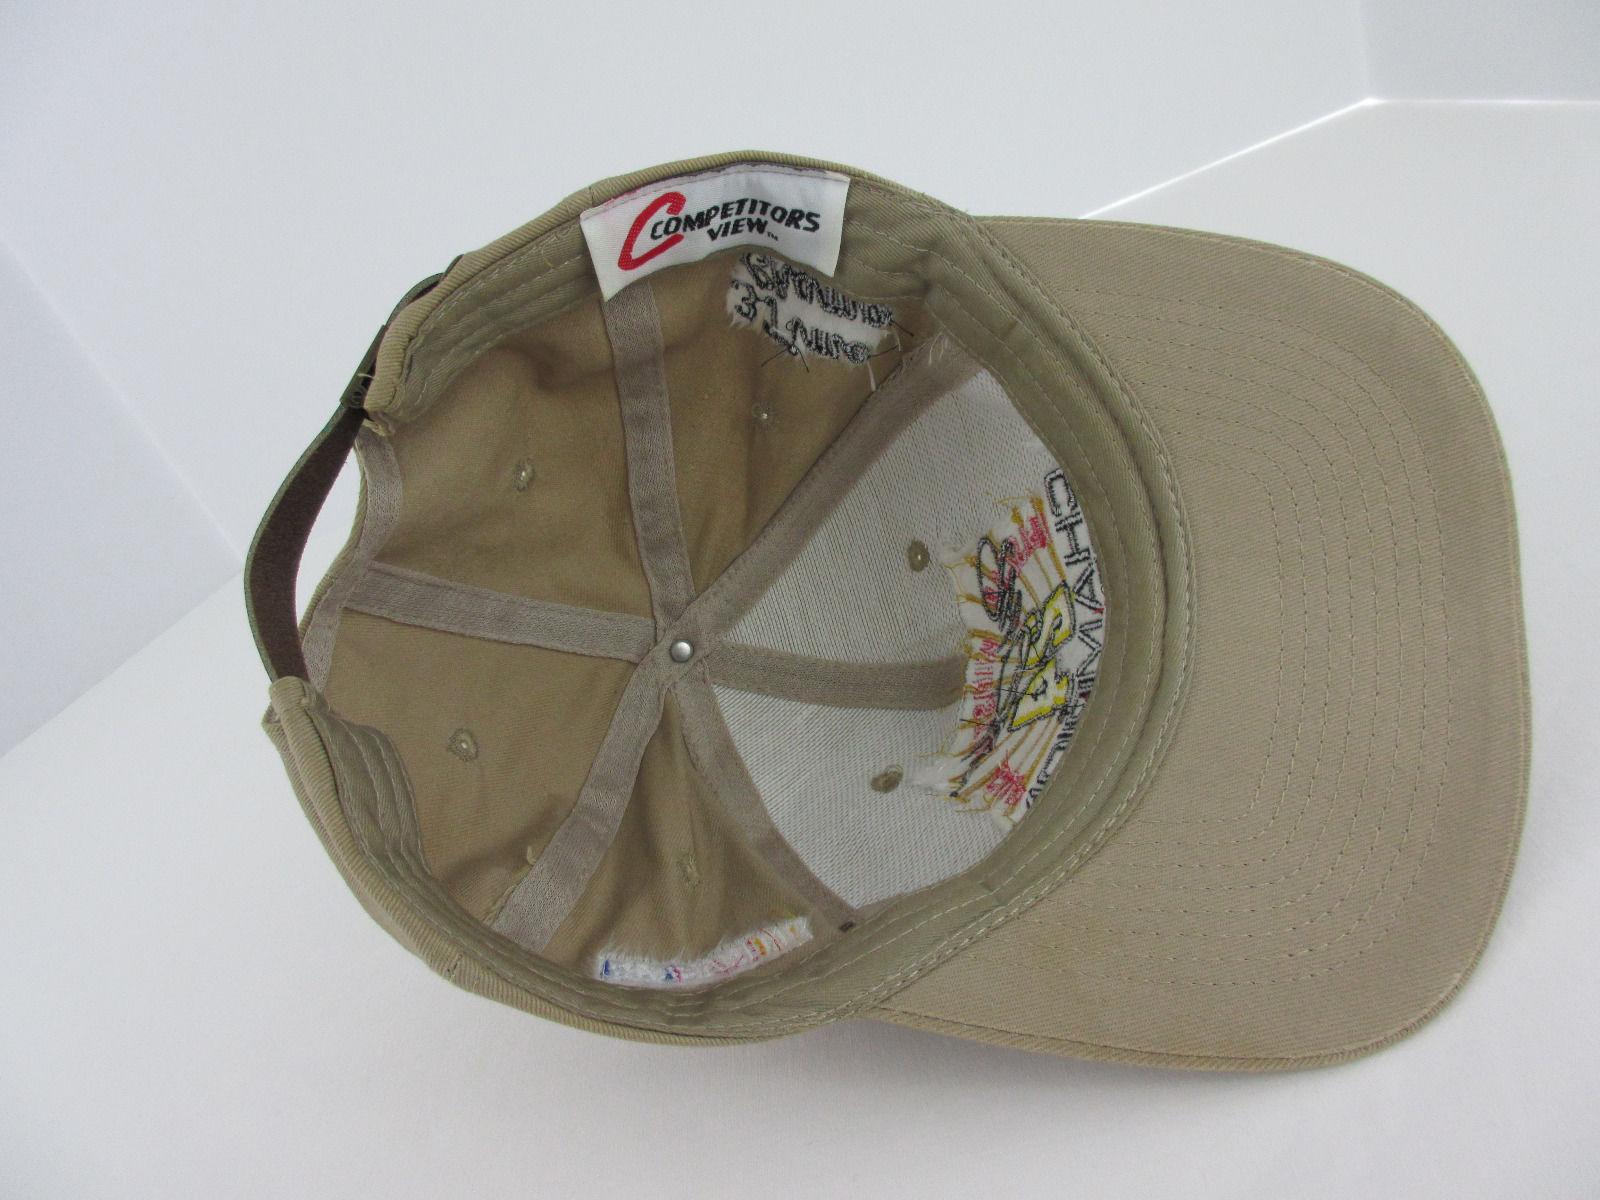 Jeff Gordon 24 Vintage 1995/1996/1997 Winston Cup Champion Competitors View Hat